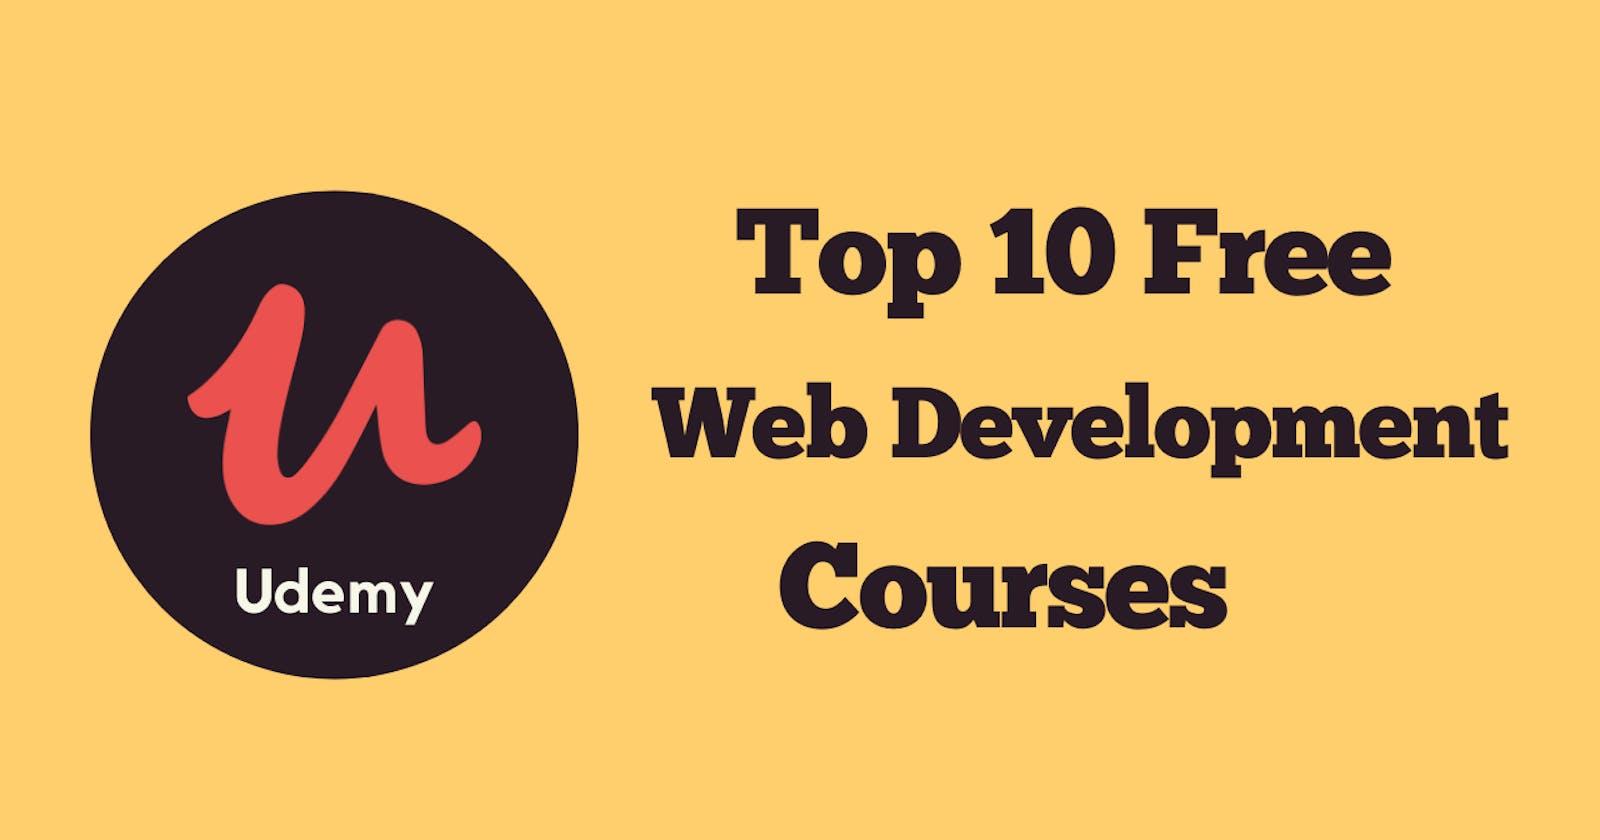 Top 10 Free Udemy Web Development Courses